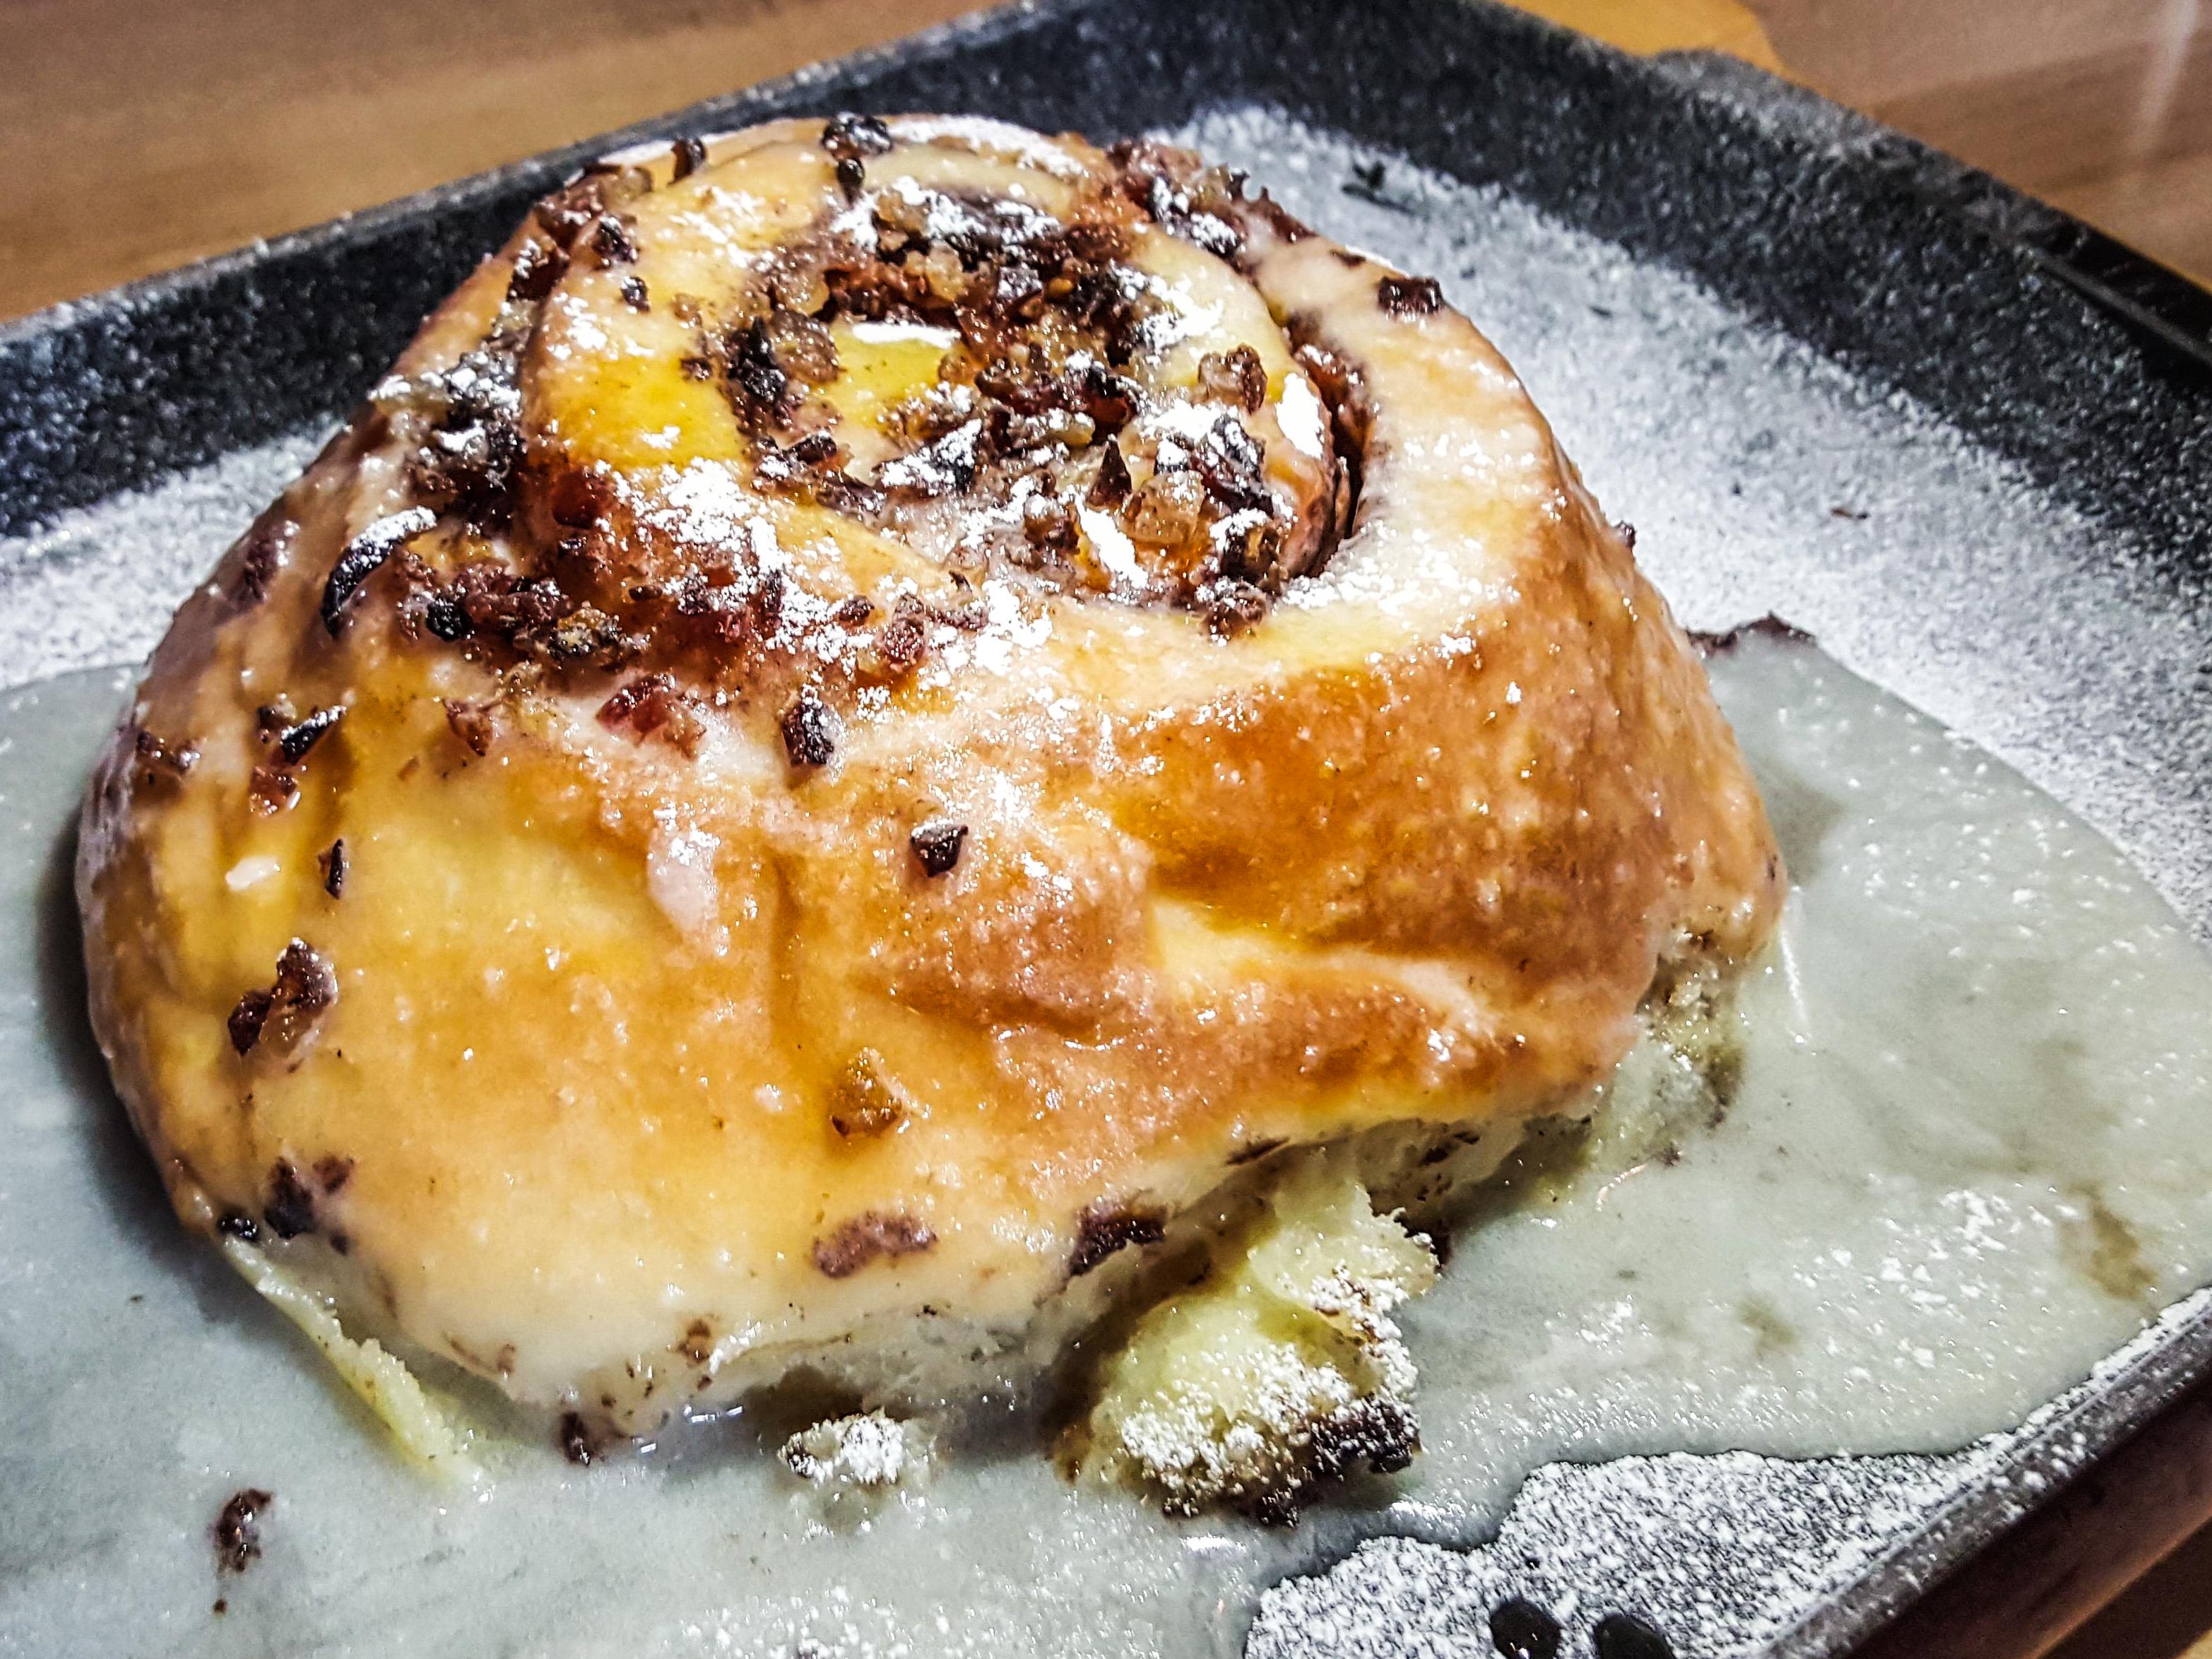 Cinnamon bun at Area Four Boston